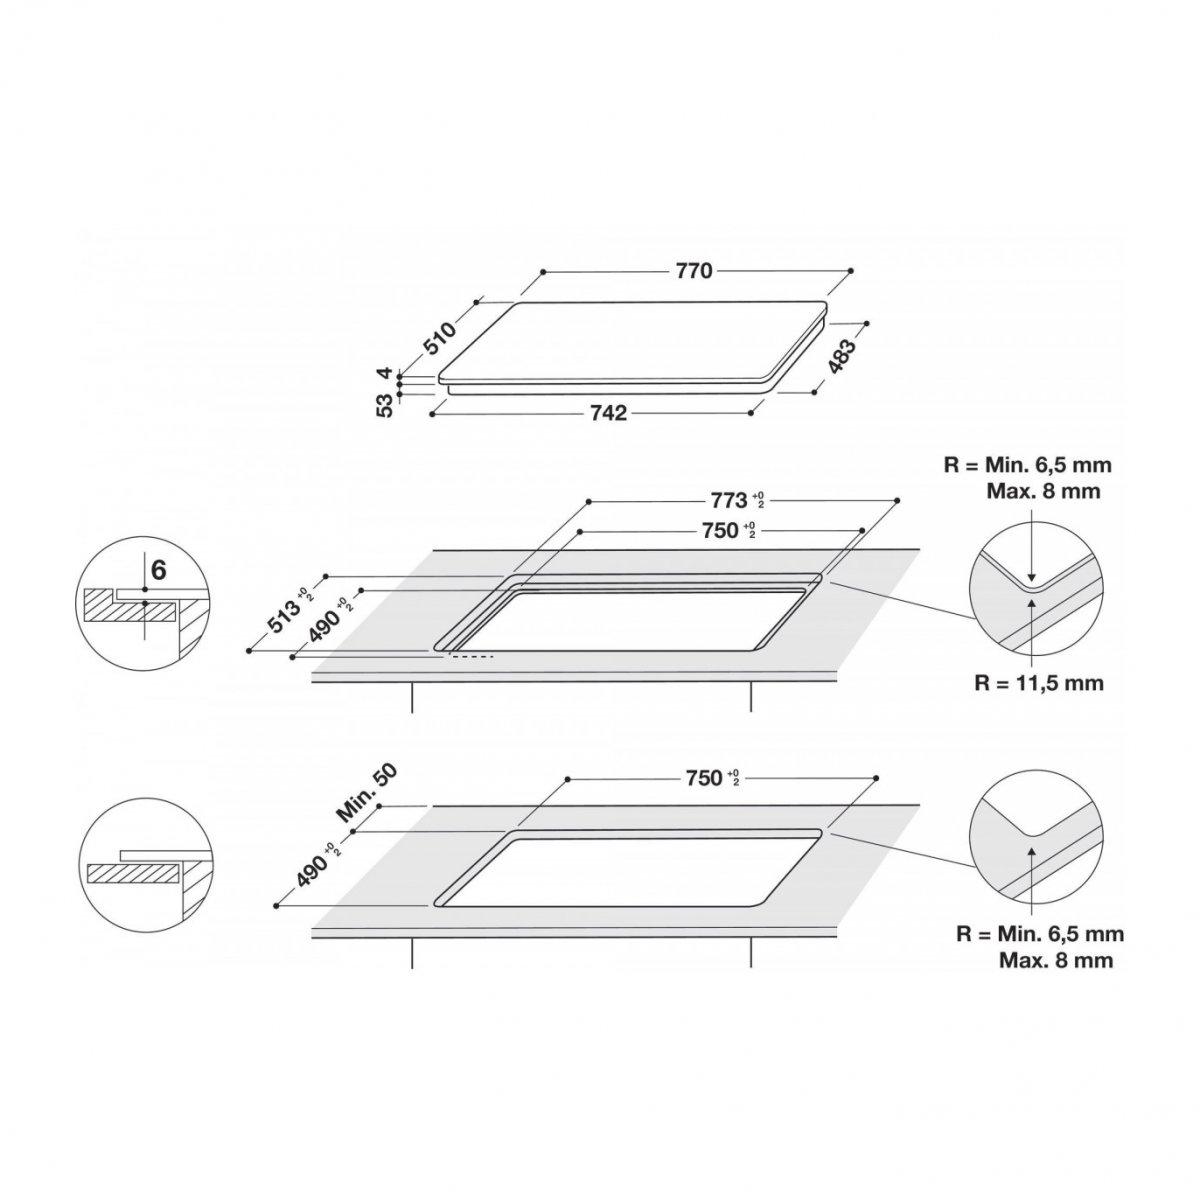 Whirlpool PIANO COTTURA INDUZIONE SMART COOK SMC774FBTIXL